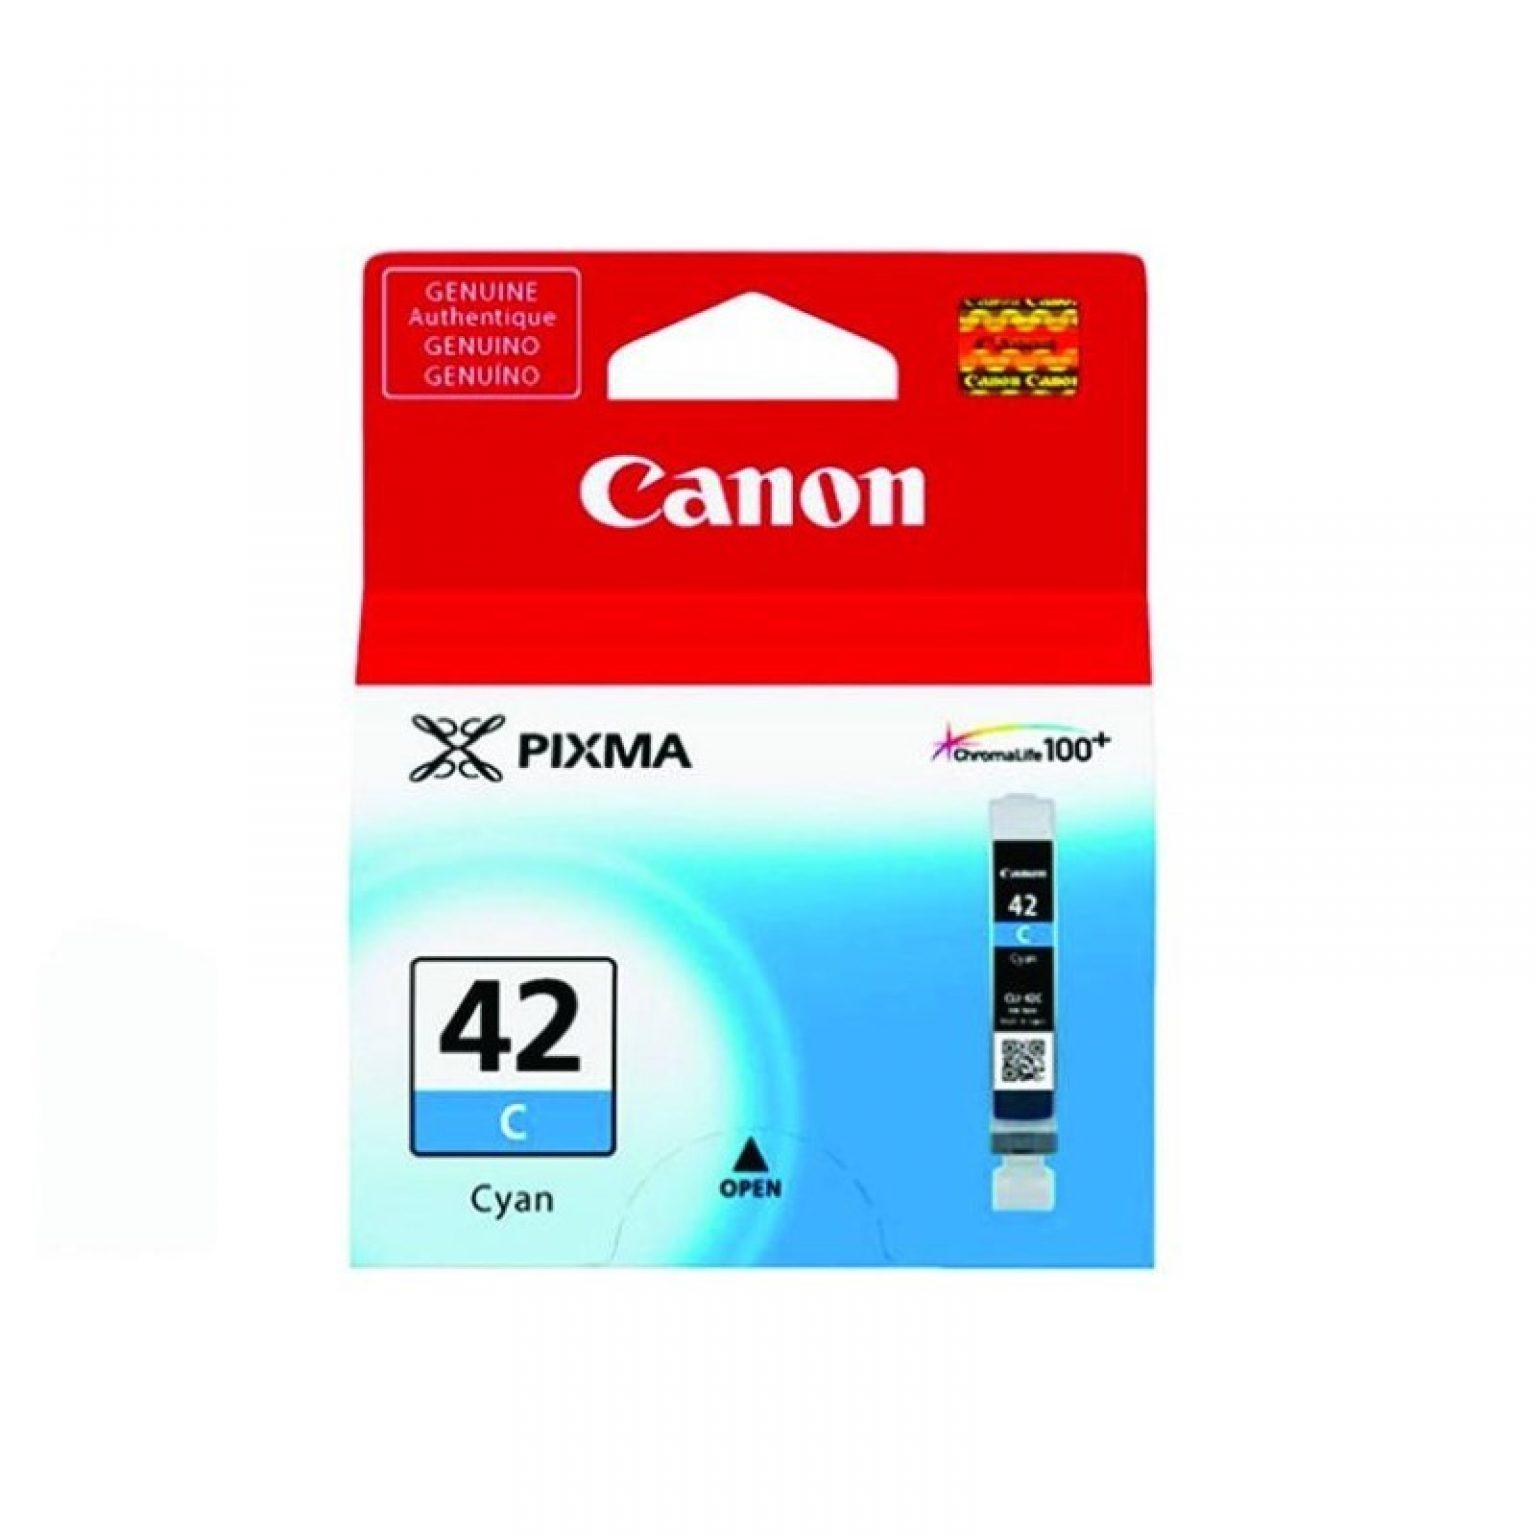 CANON - Ink Cartridge CLI-42 Cyan for Pro-100 [CLI42C]